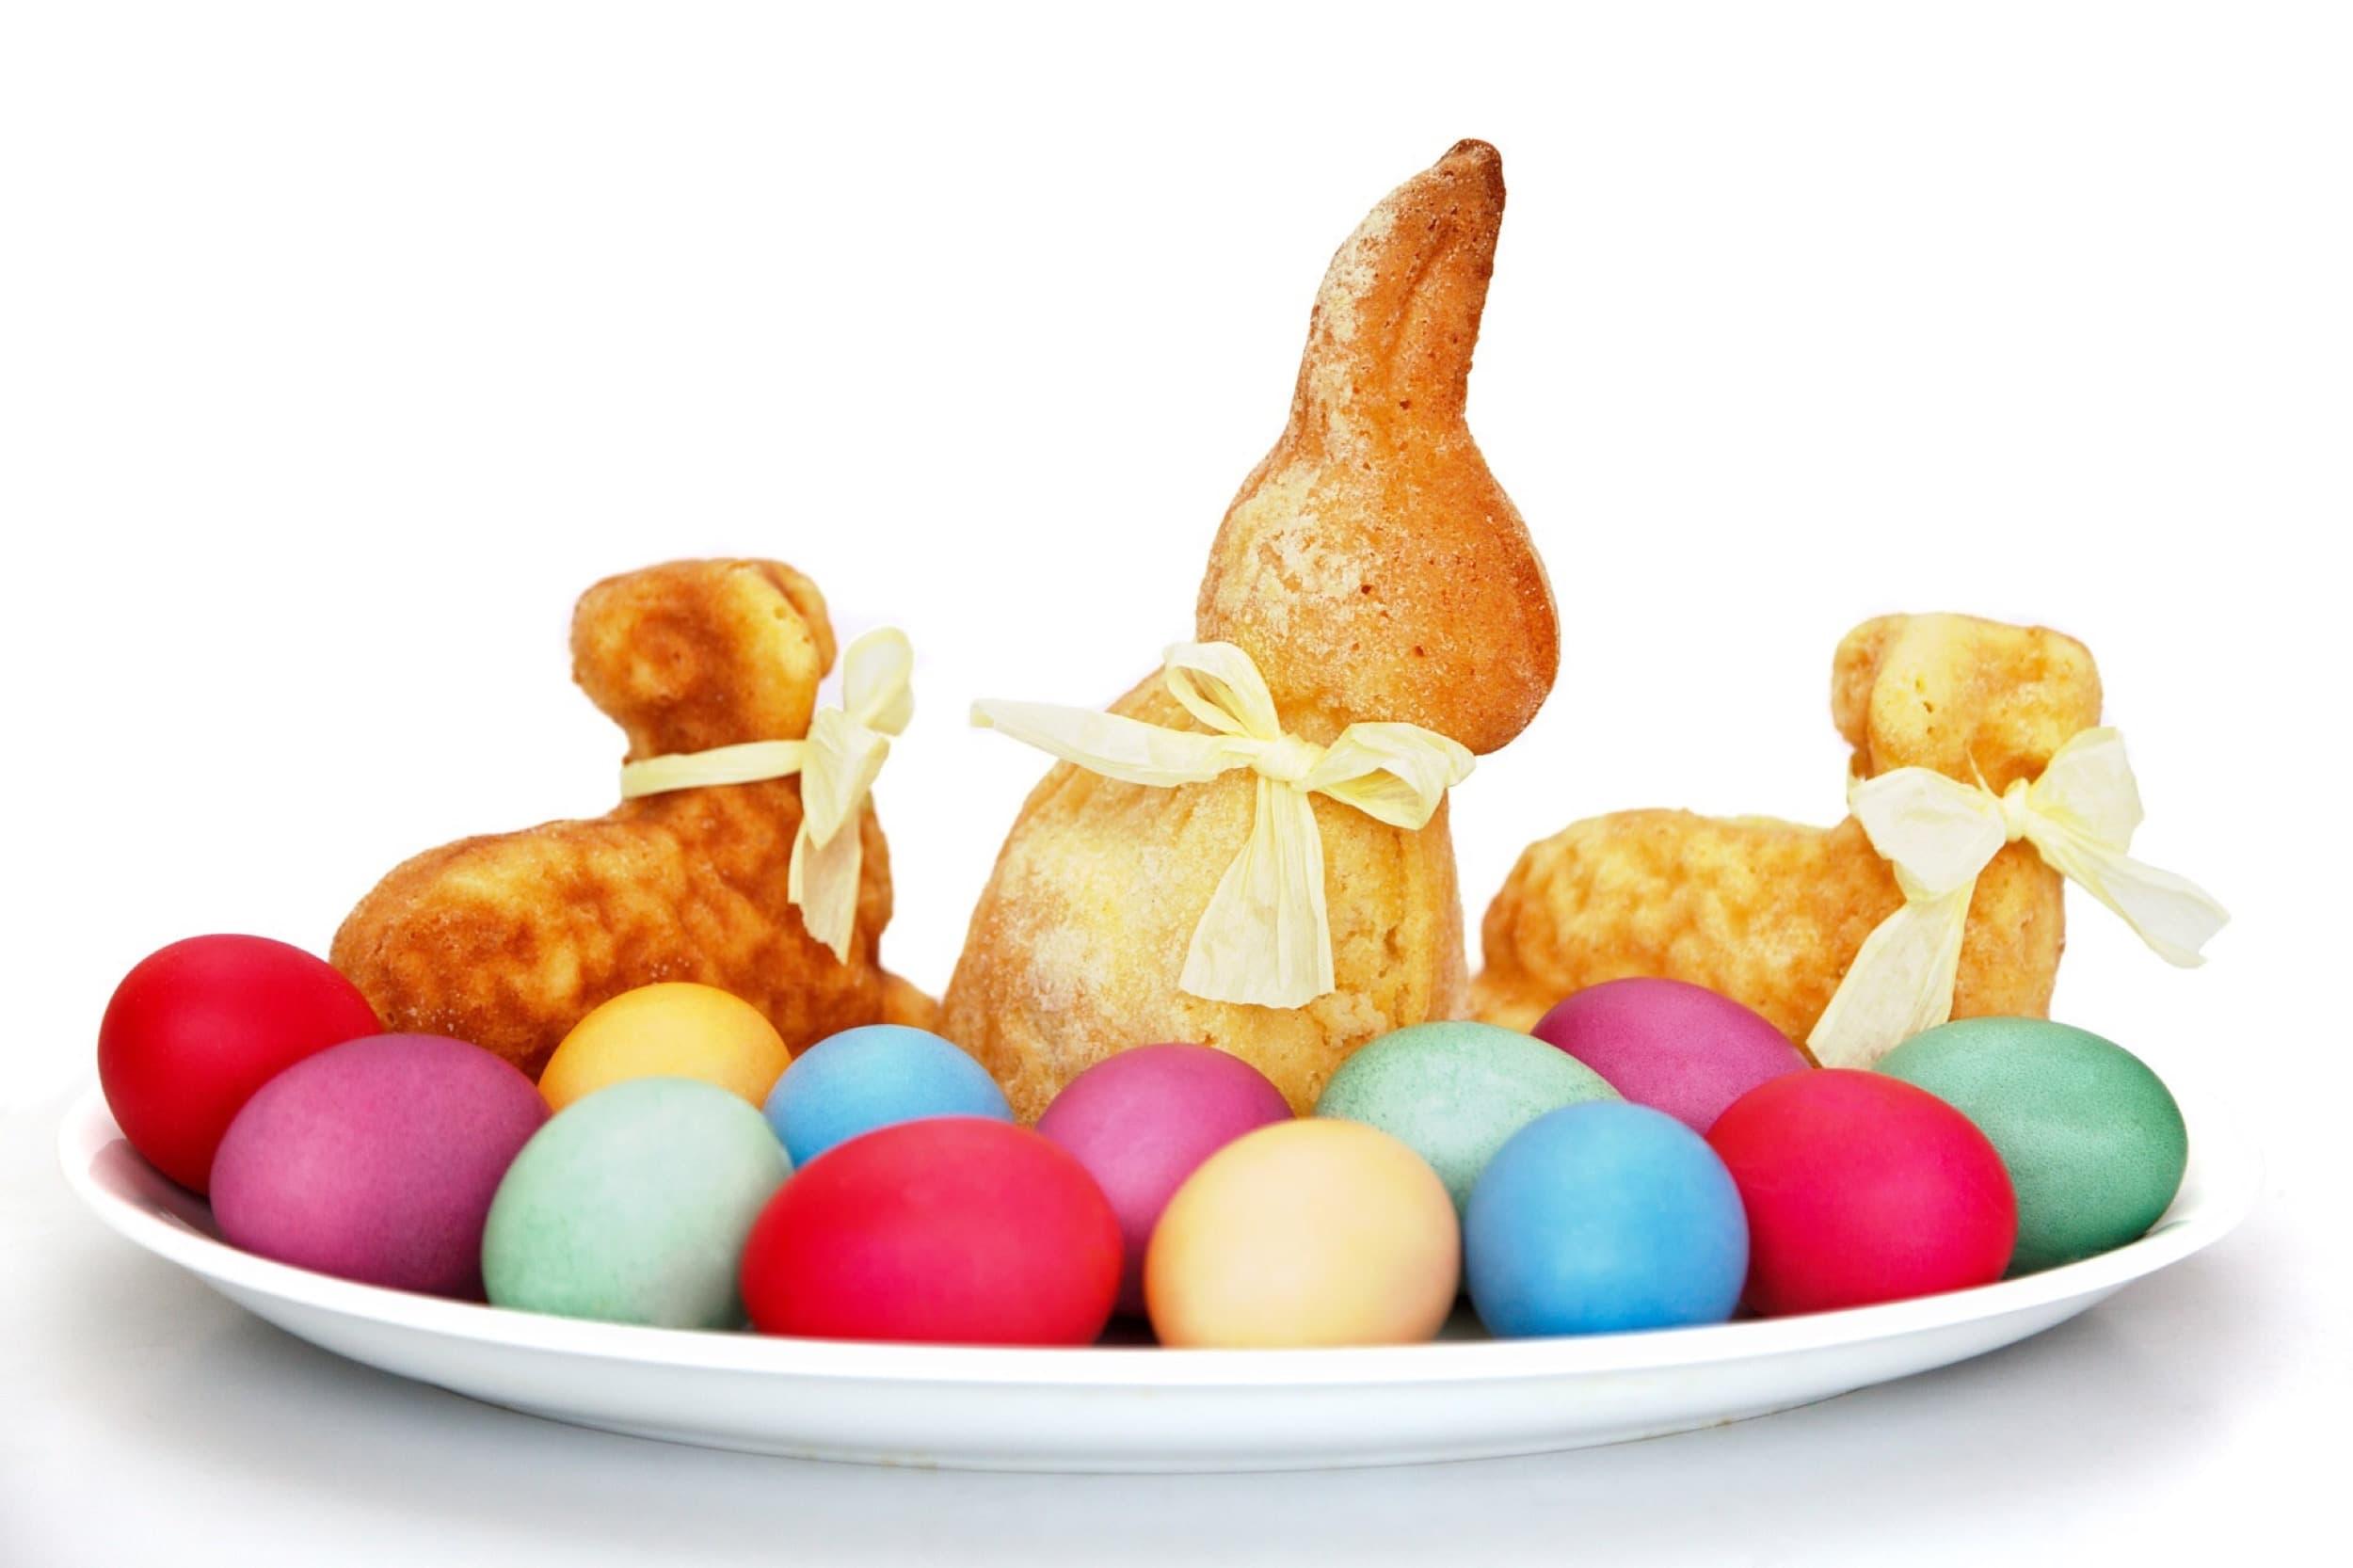 eggs copy 2.jpg